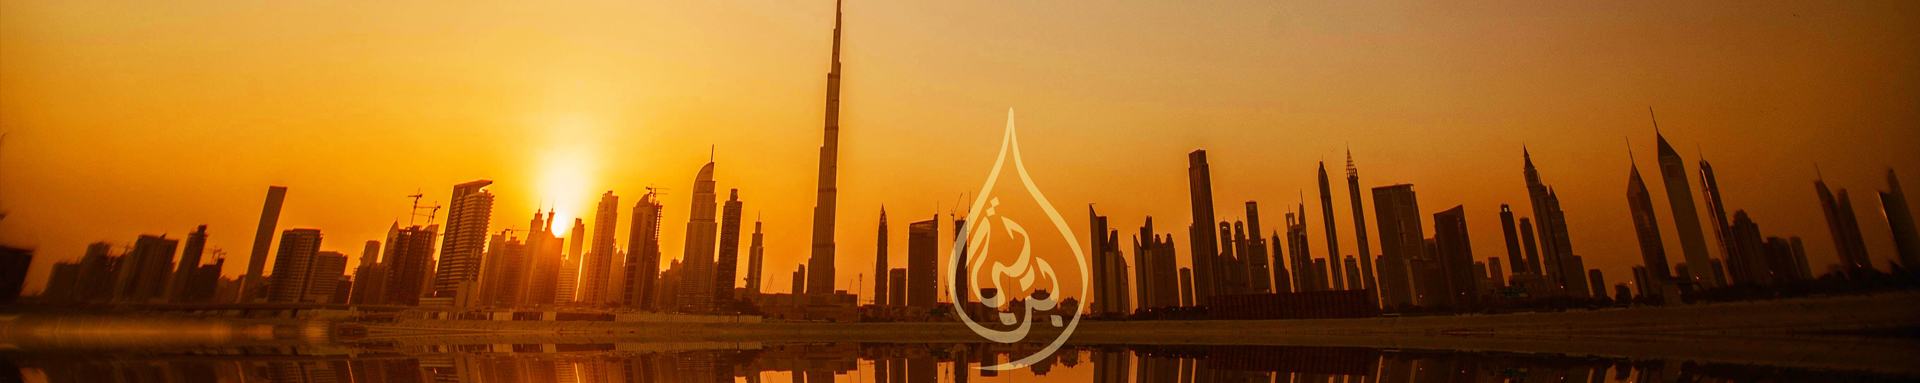 Emirates Hills Apartments for Sale in Dubai